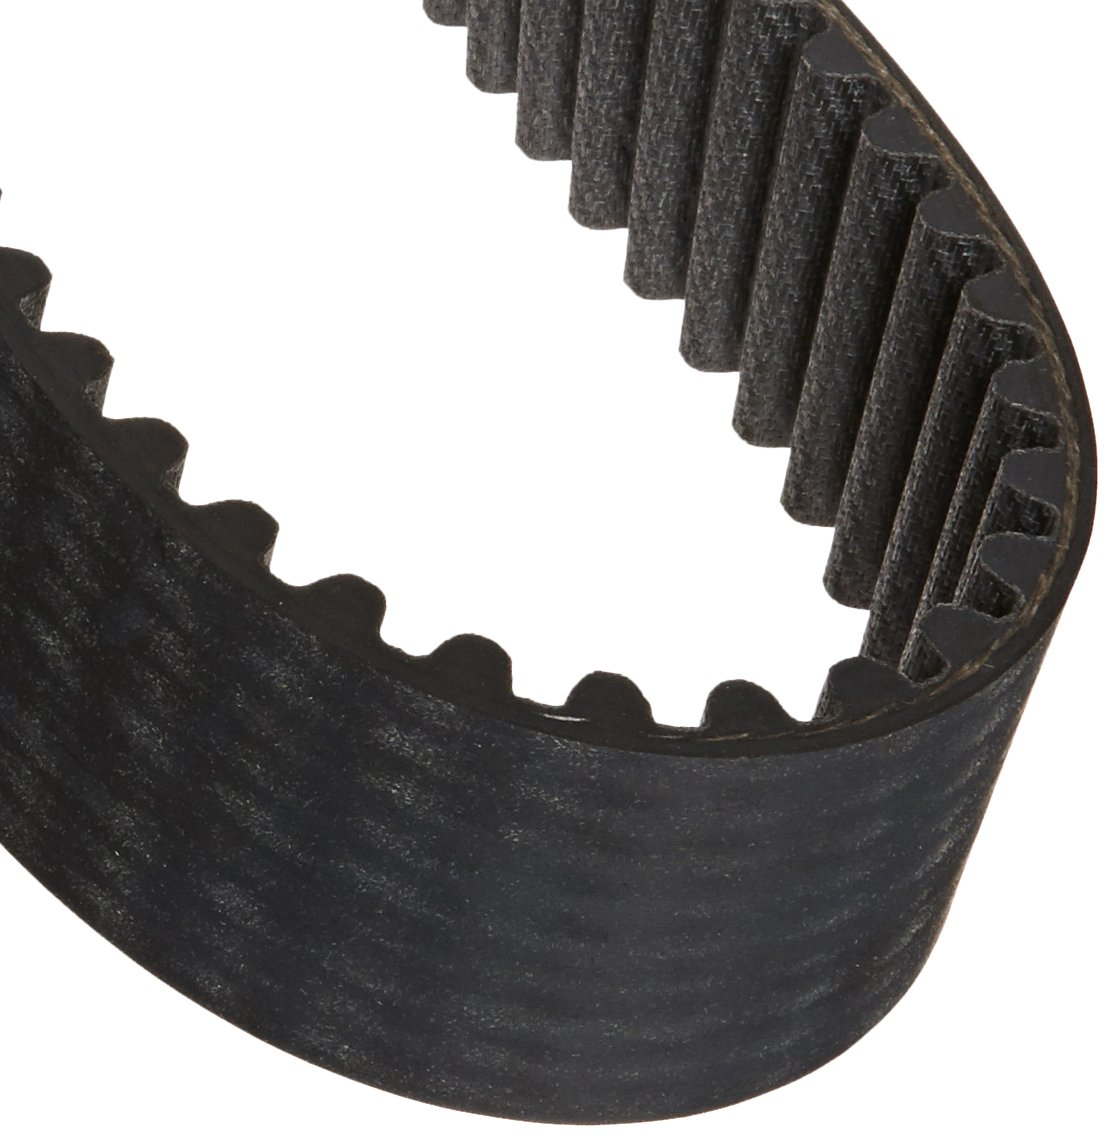 85mm Width Gates 4578-14MGT-85 GT 2 PowerGrip Belt 180.24 Pitch Length 14mm Pitch 327 Teeth